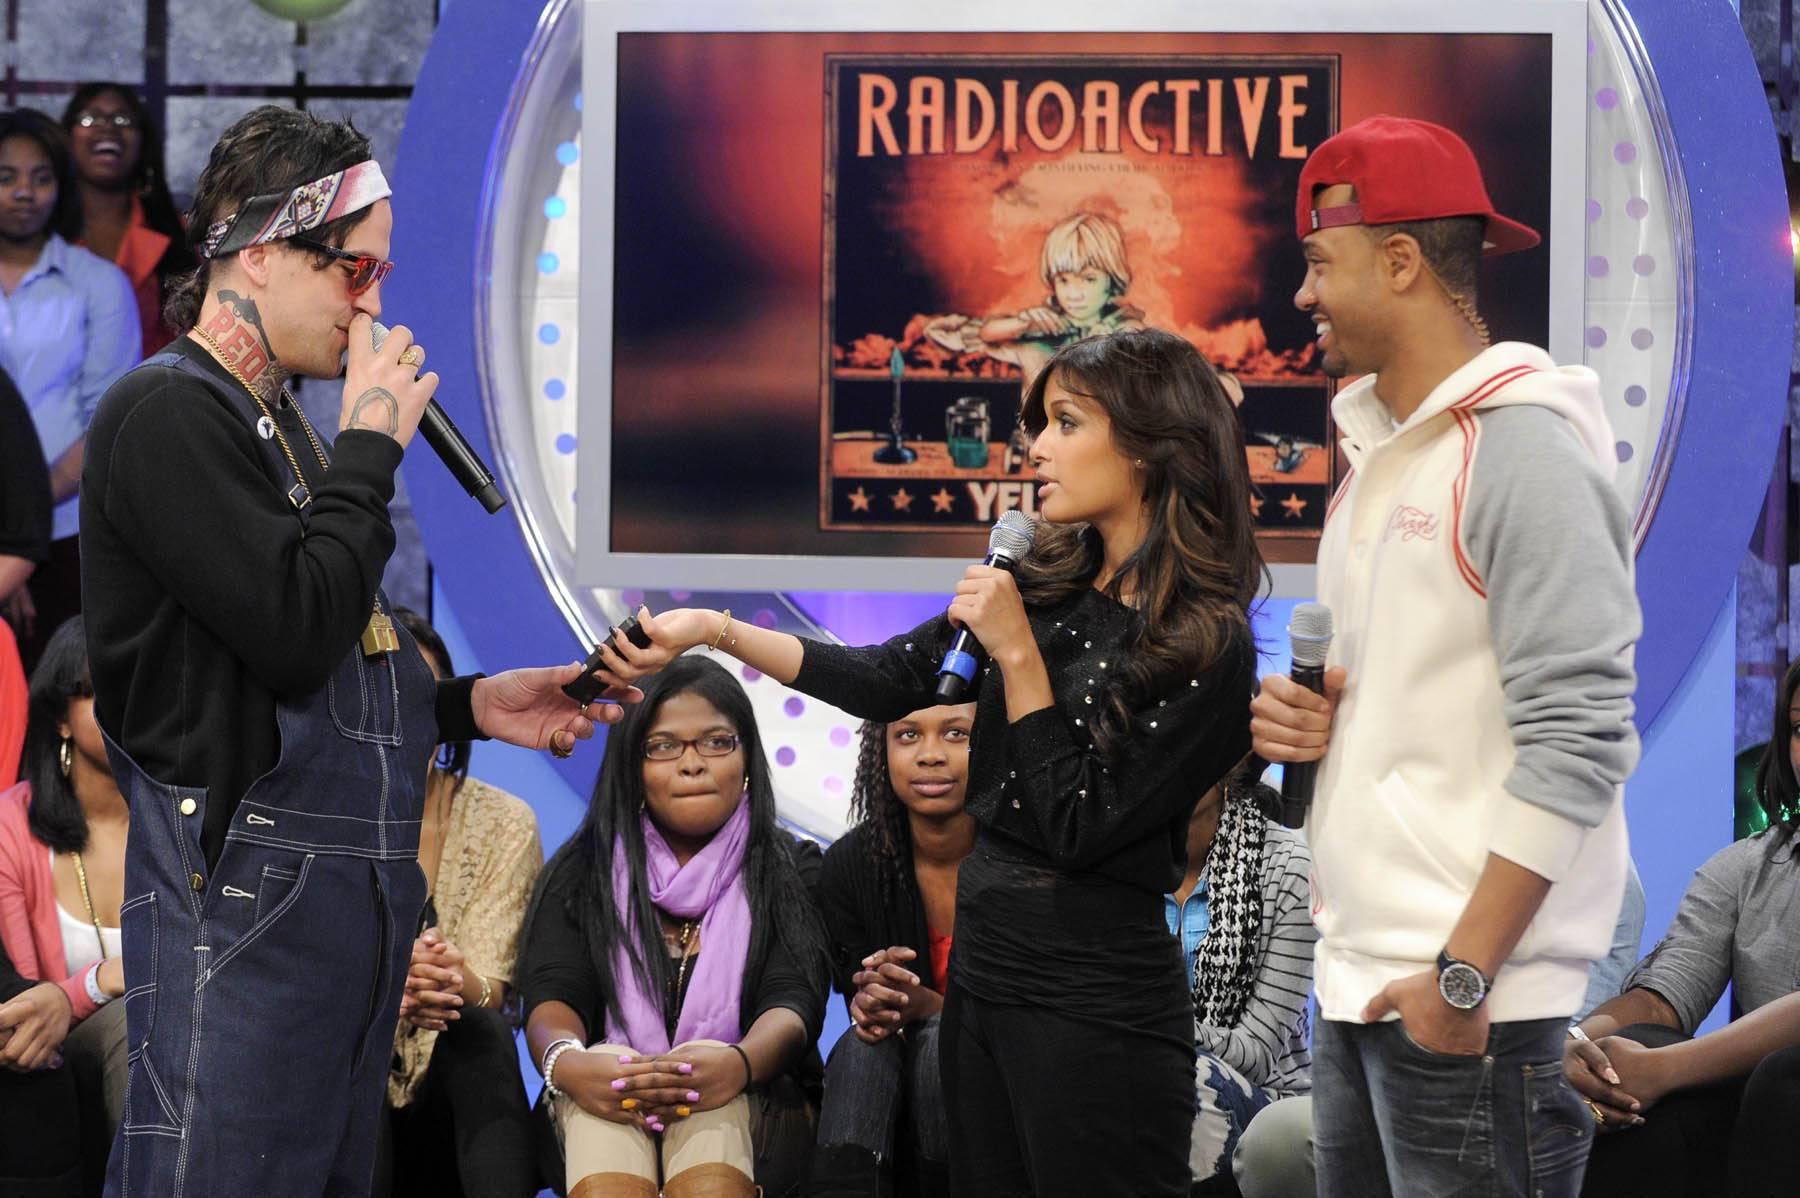 Radioactive - Yelawolf with Rocsi Diaz and Terrence J at 106 & Park, January 27, 2012. (Photo: John Ricard / BET)